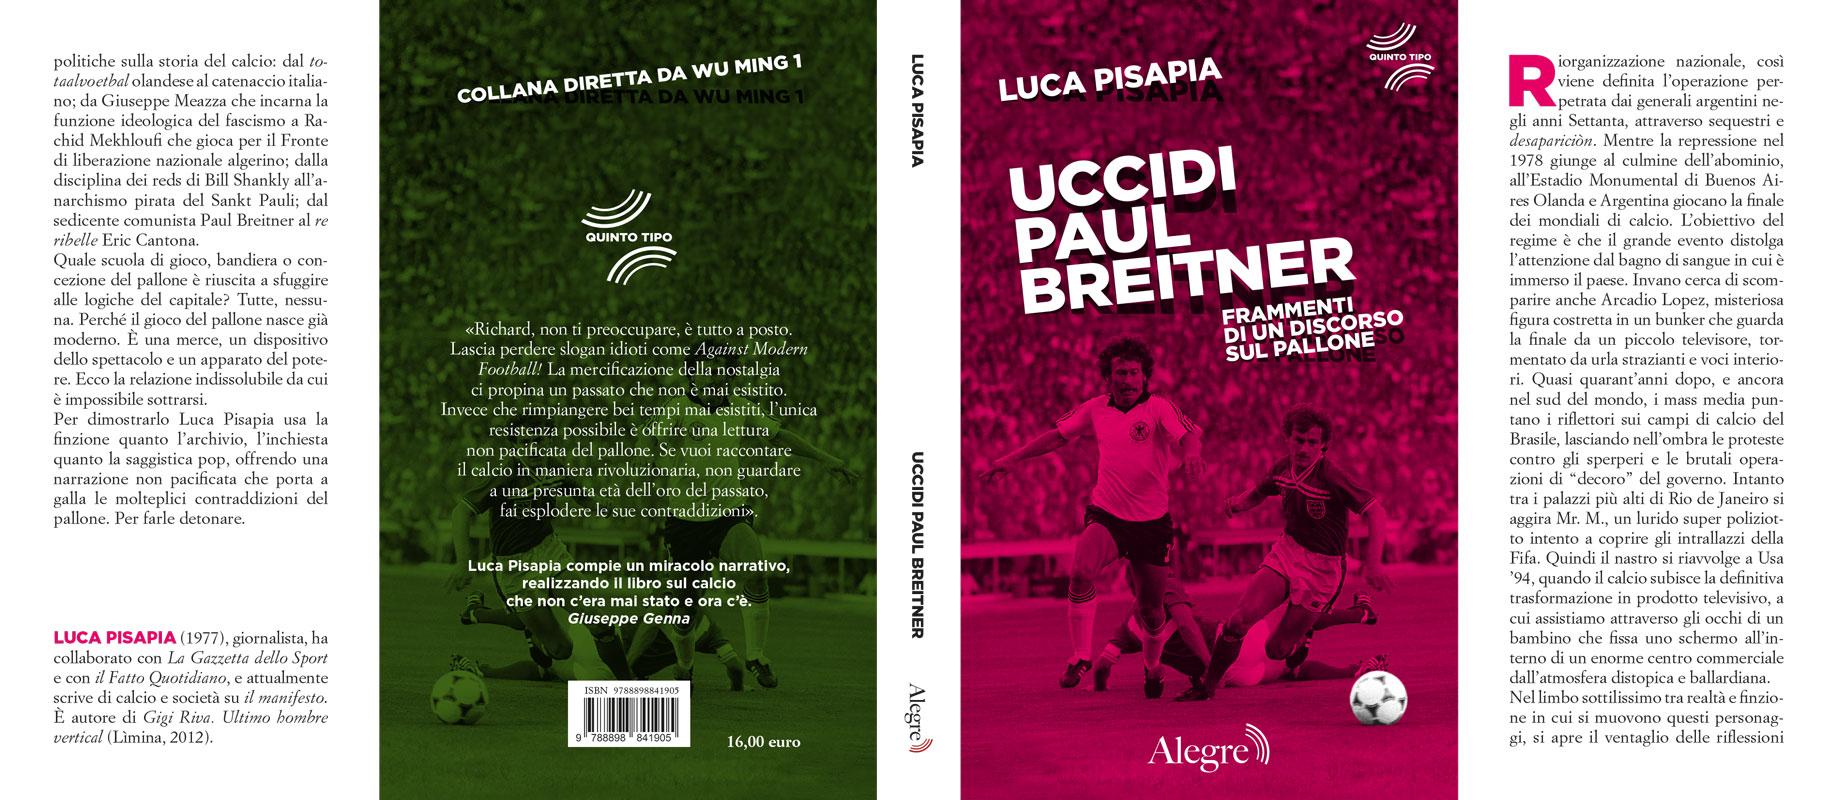 Luca Pisapia, Uccidi Paul Breitner, stesa